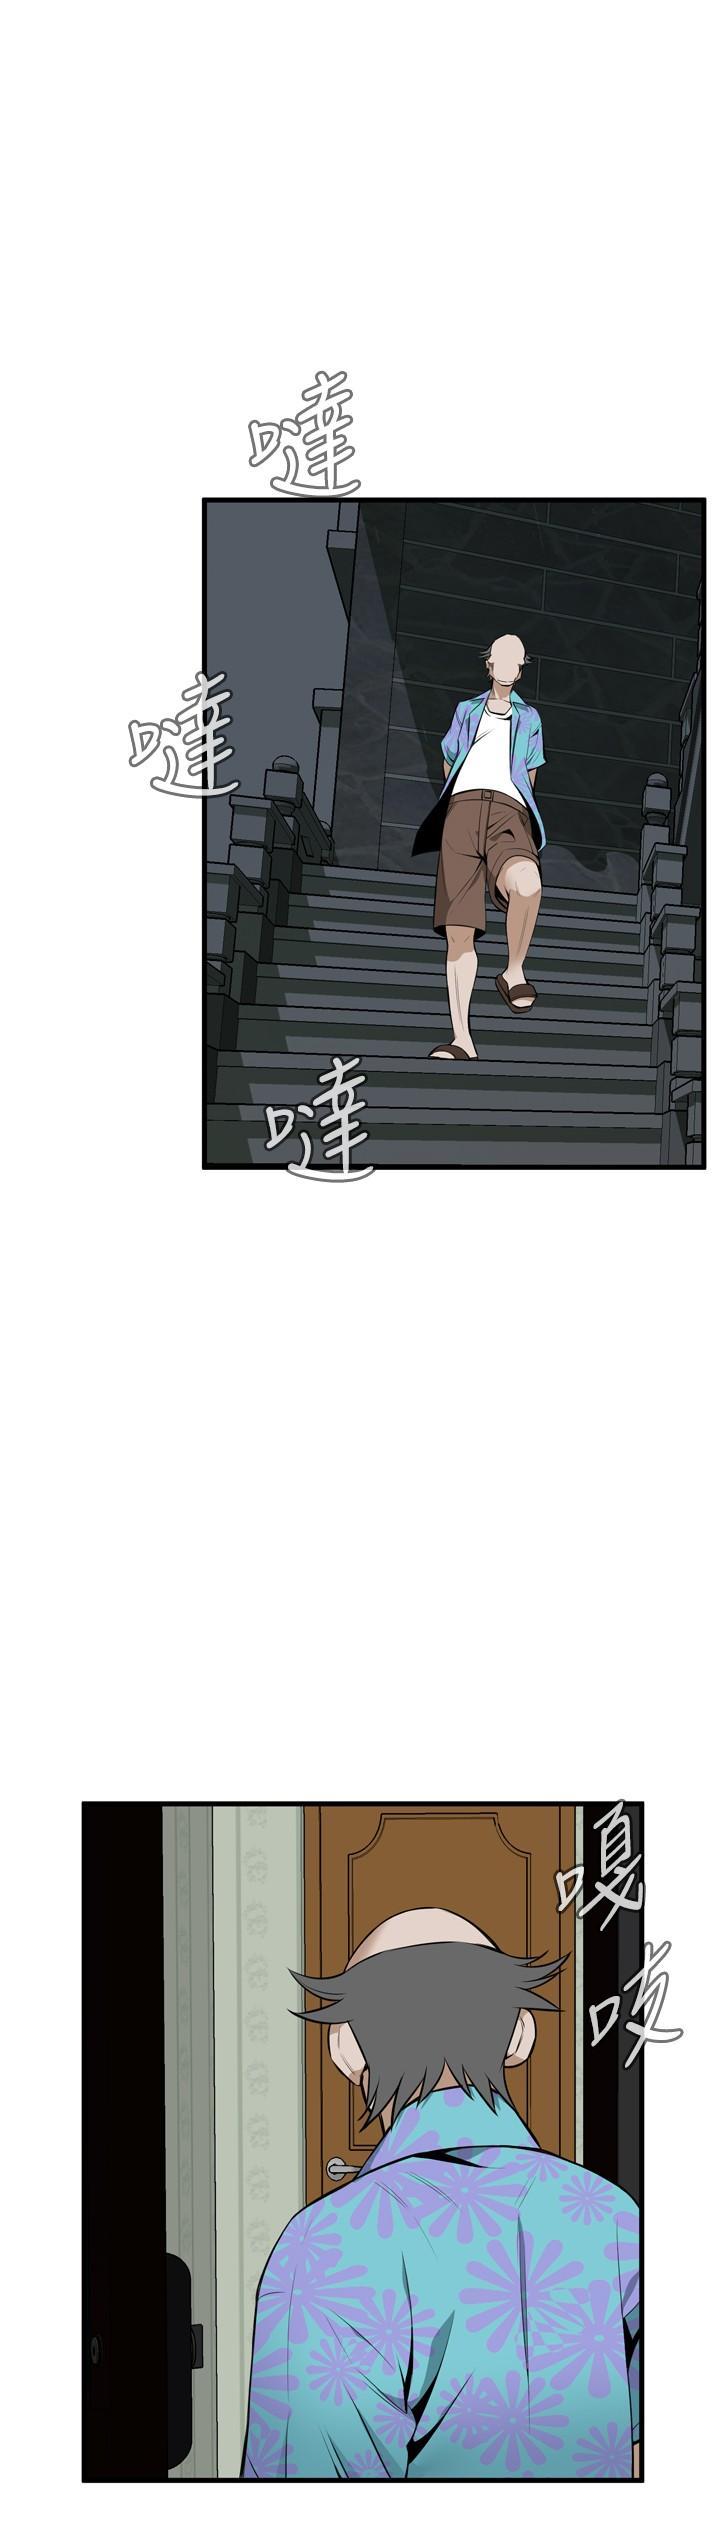 Take a Peek 偷窥 Ch.39~55 [Chinese]中文 142